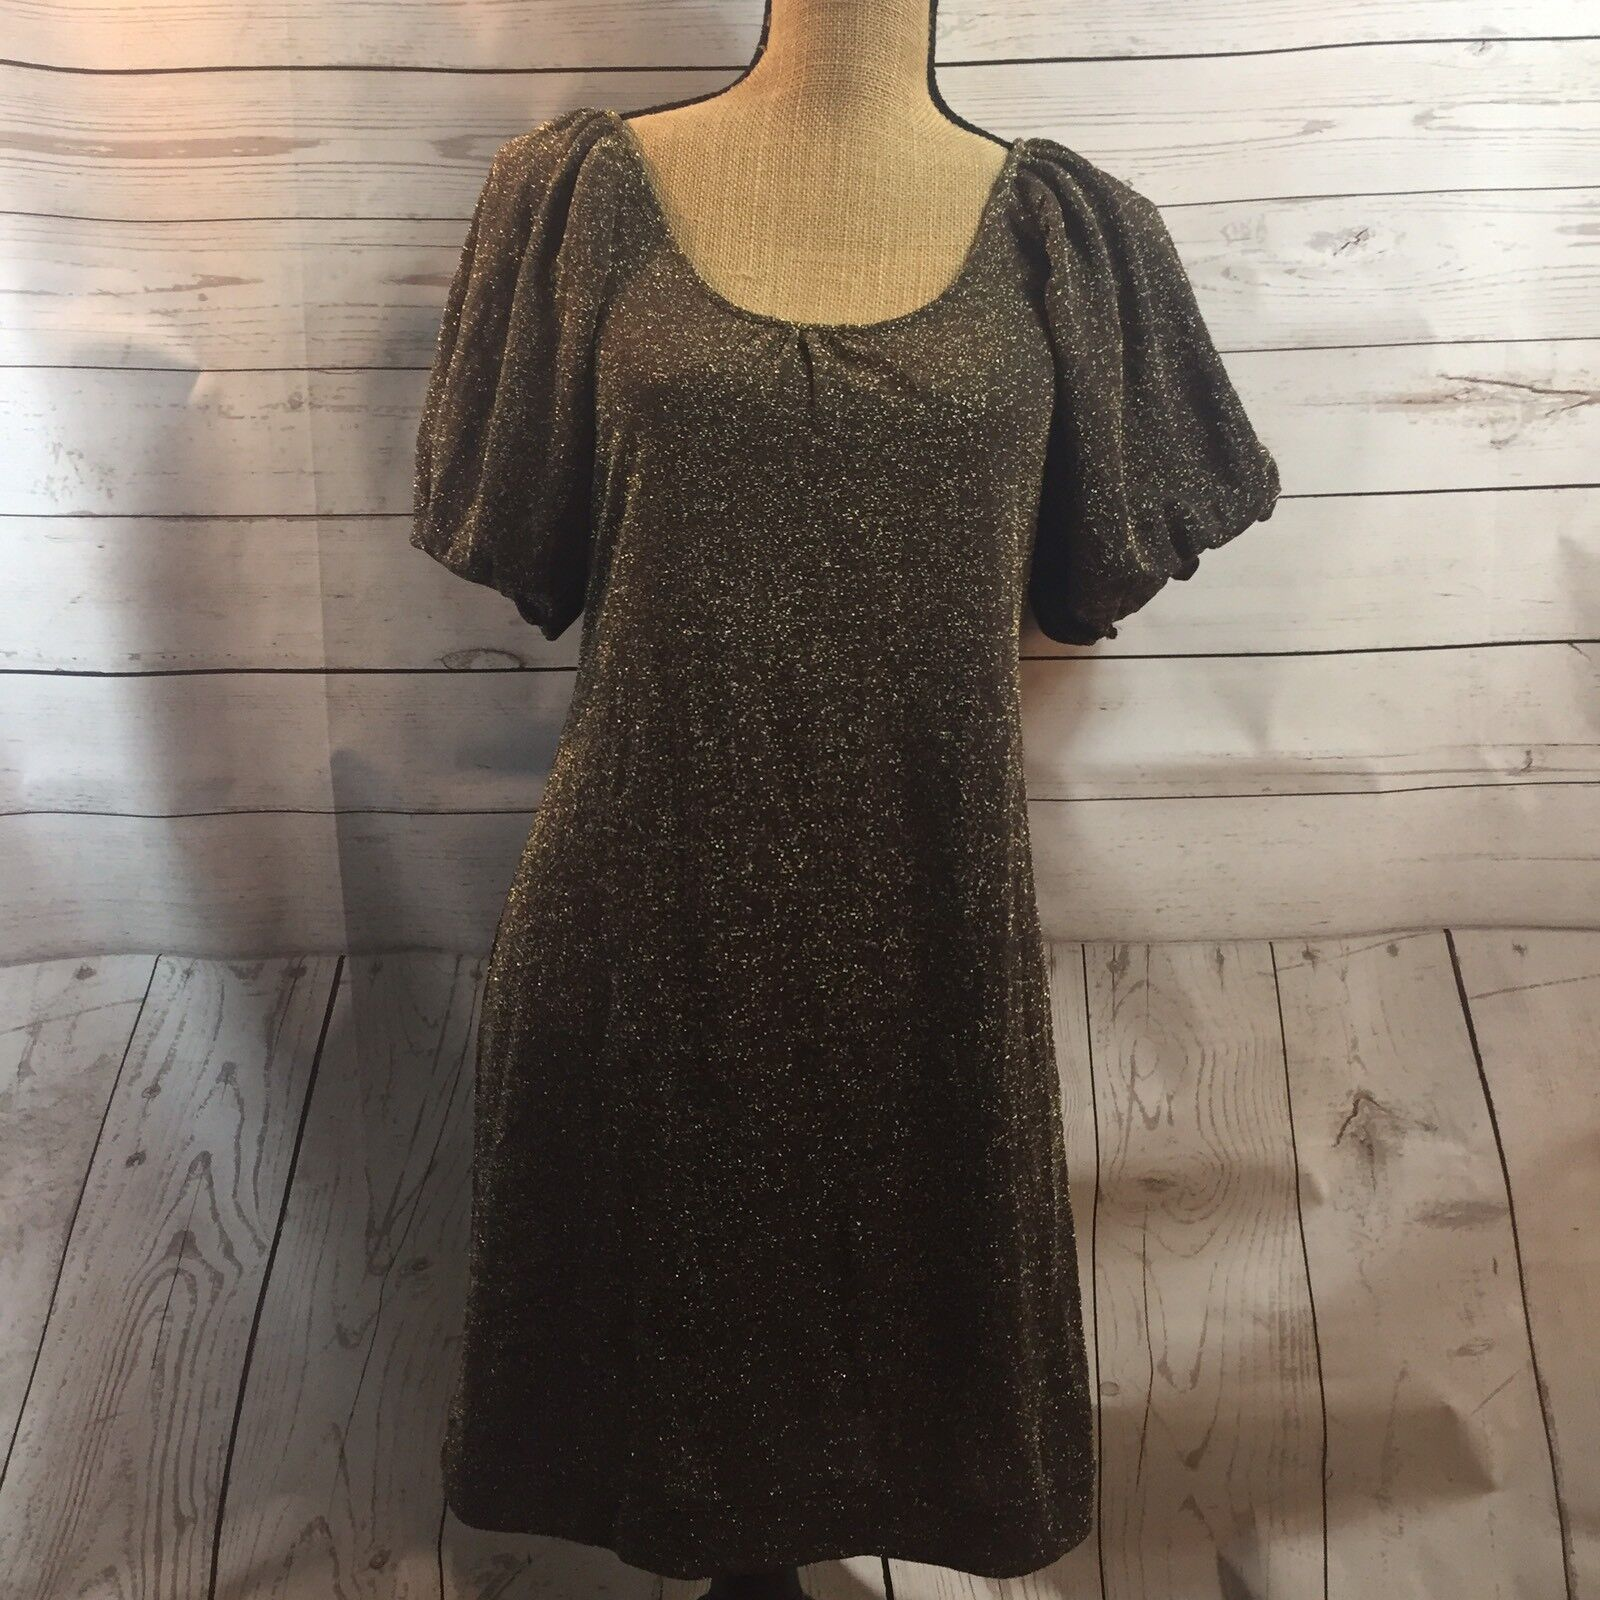 BCBG Maxazria  Cocoa  gold Sparkl Short Sleeve Dress Size M NWT  210.00